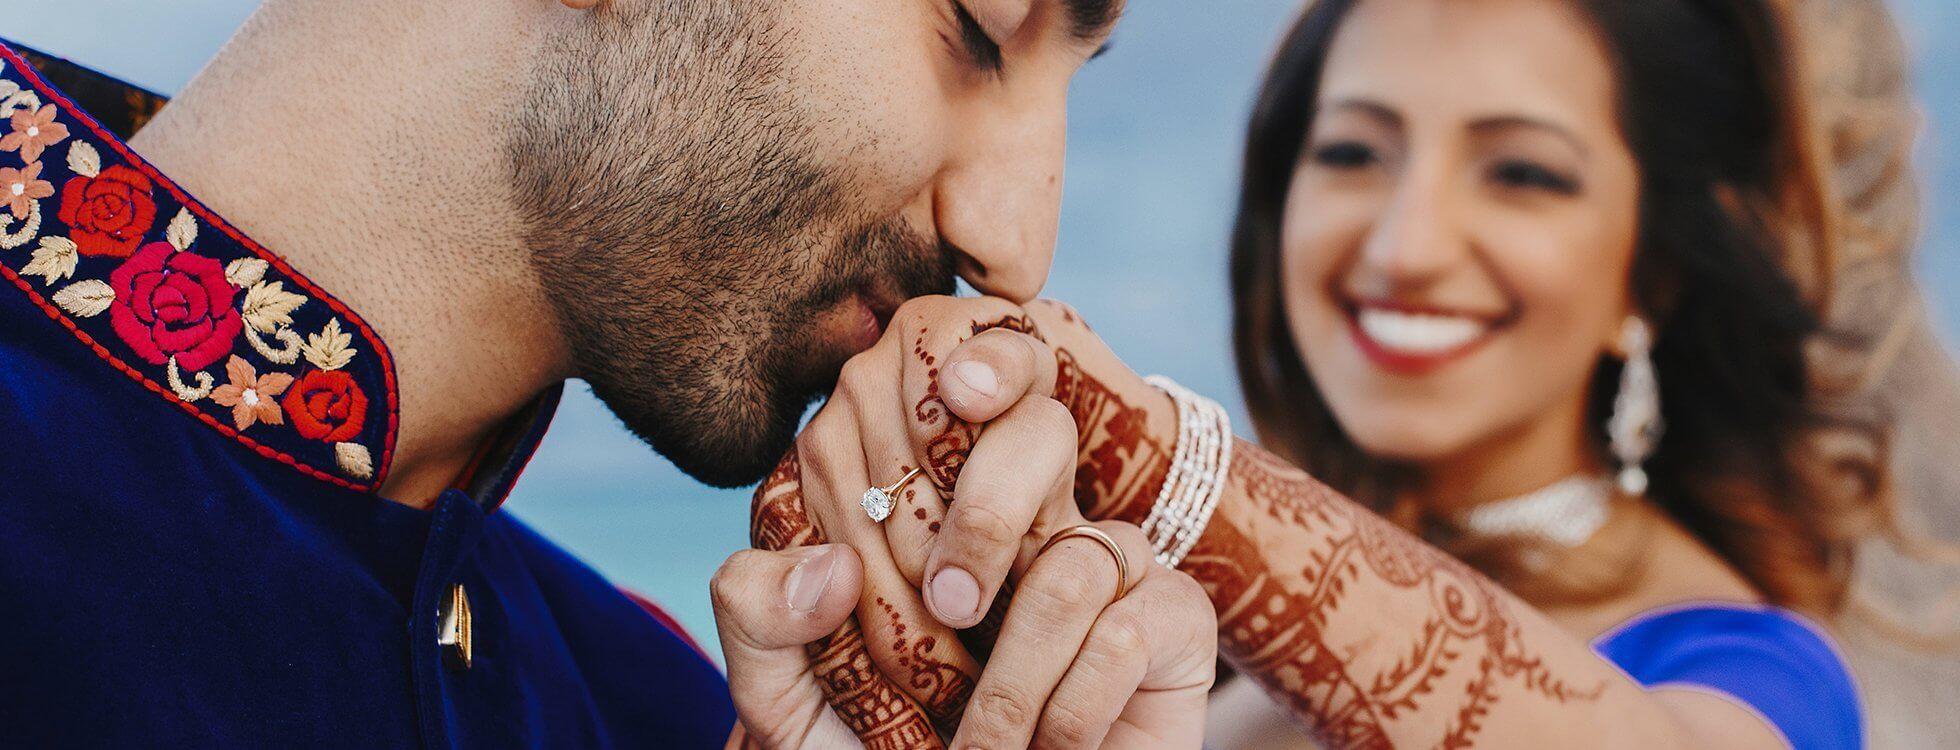 NRI Matrimony, Matrimonials, Bride, Groom